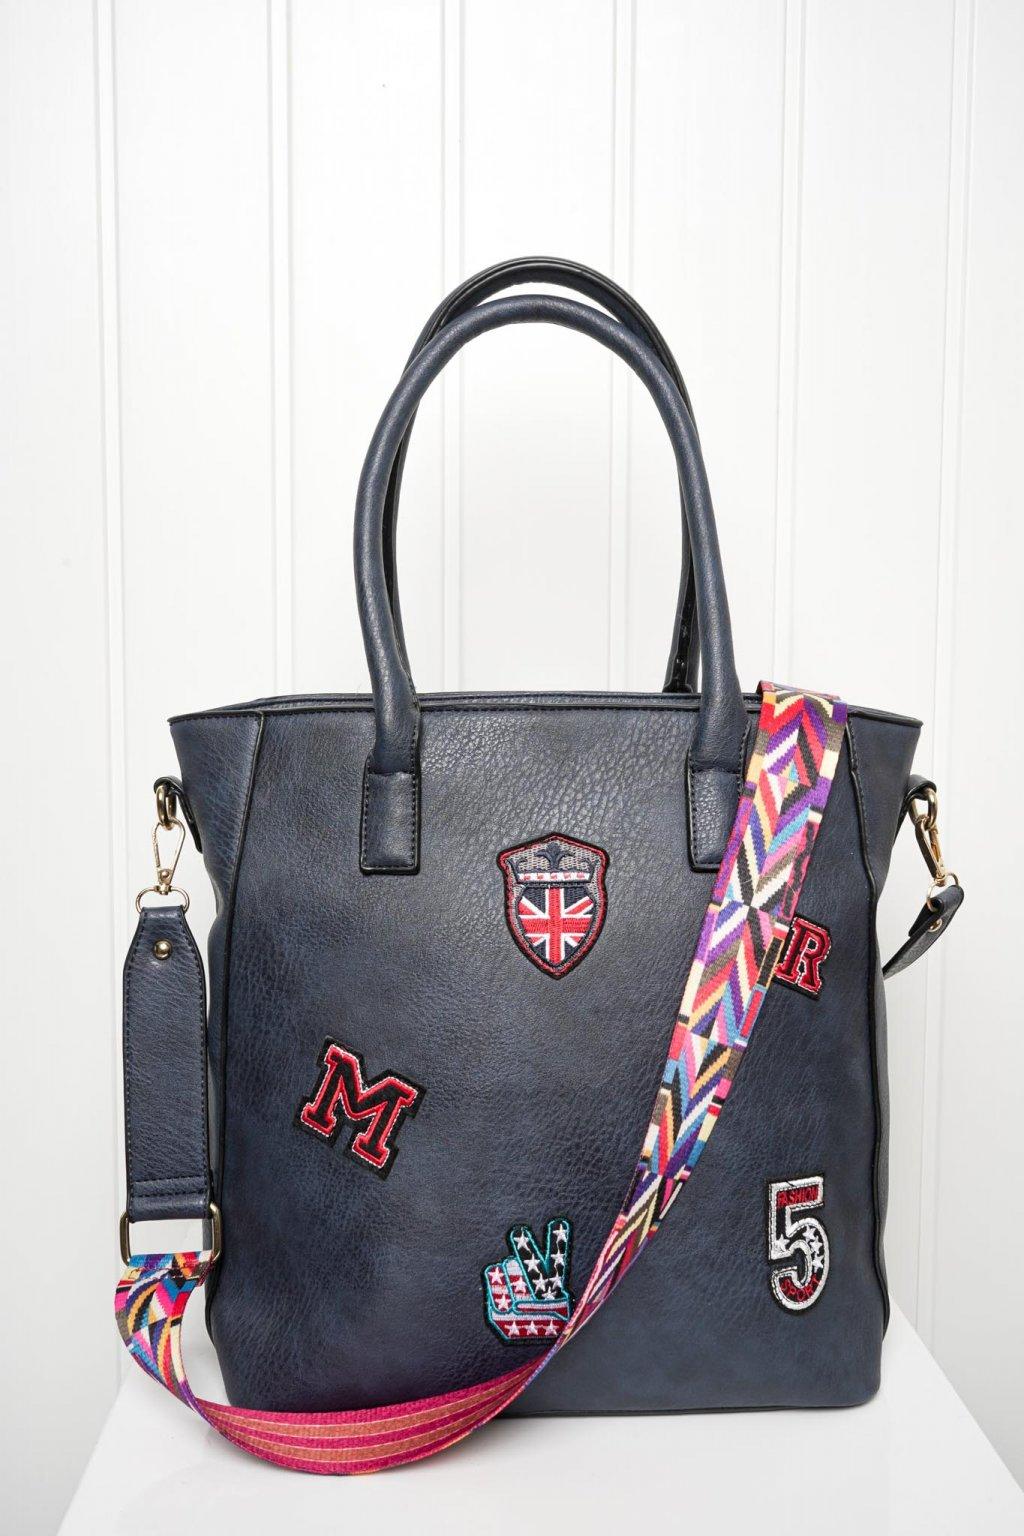 Kabelka, crossbody, ruksak, shopping bag, shopperka, 017